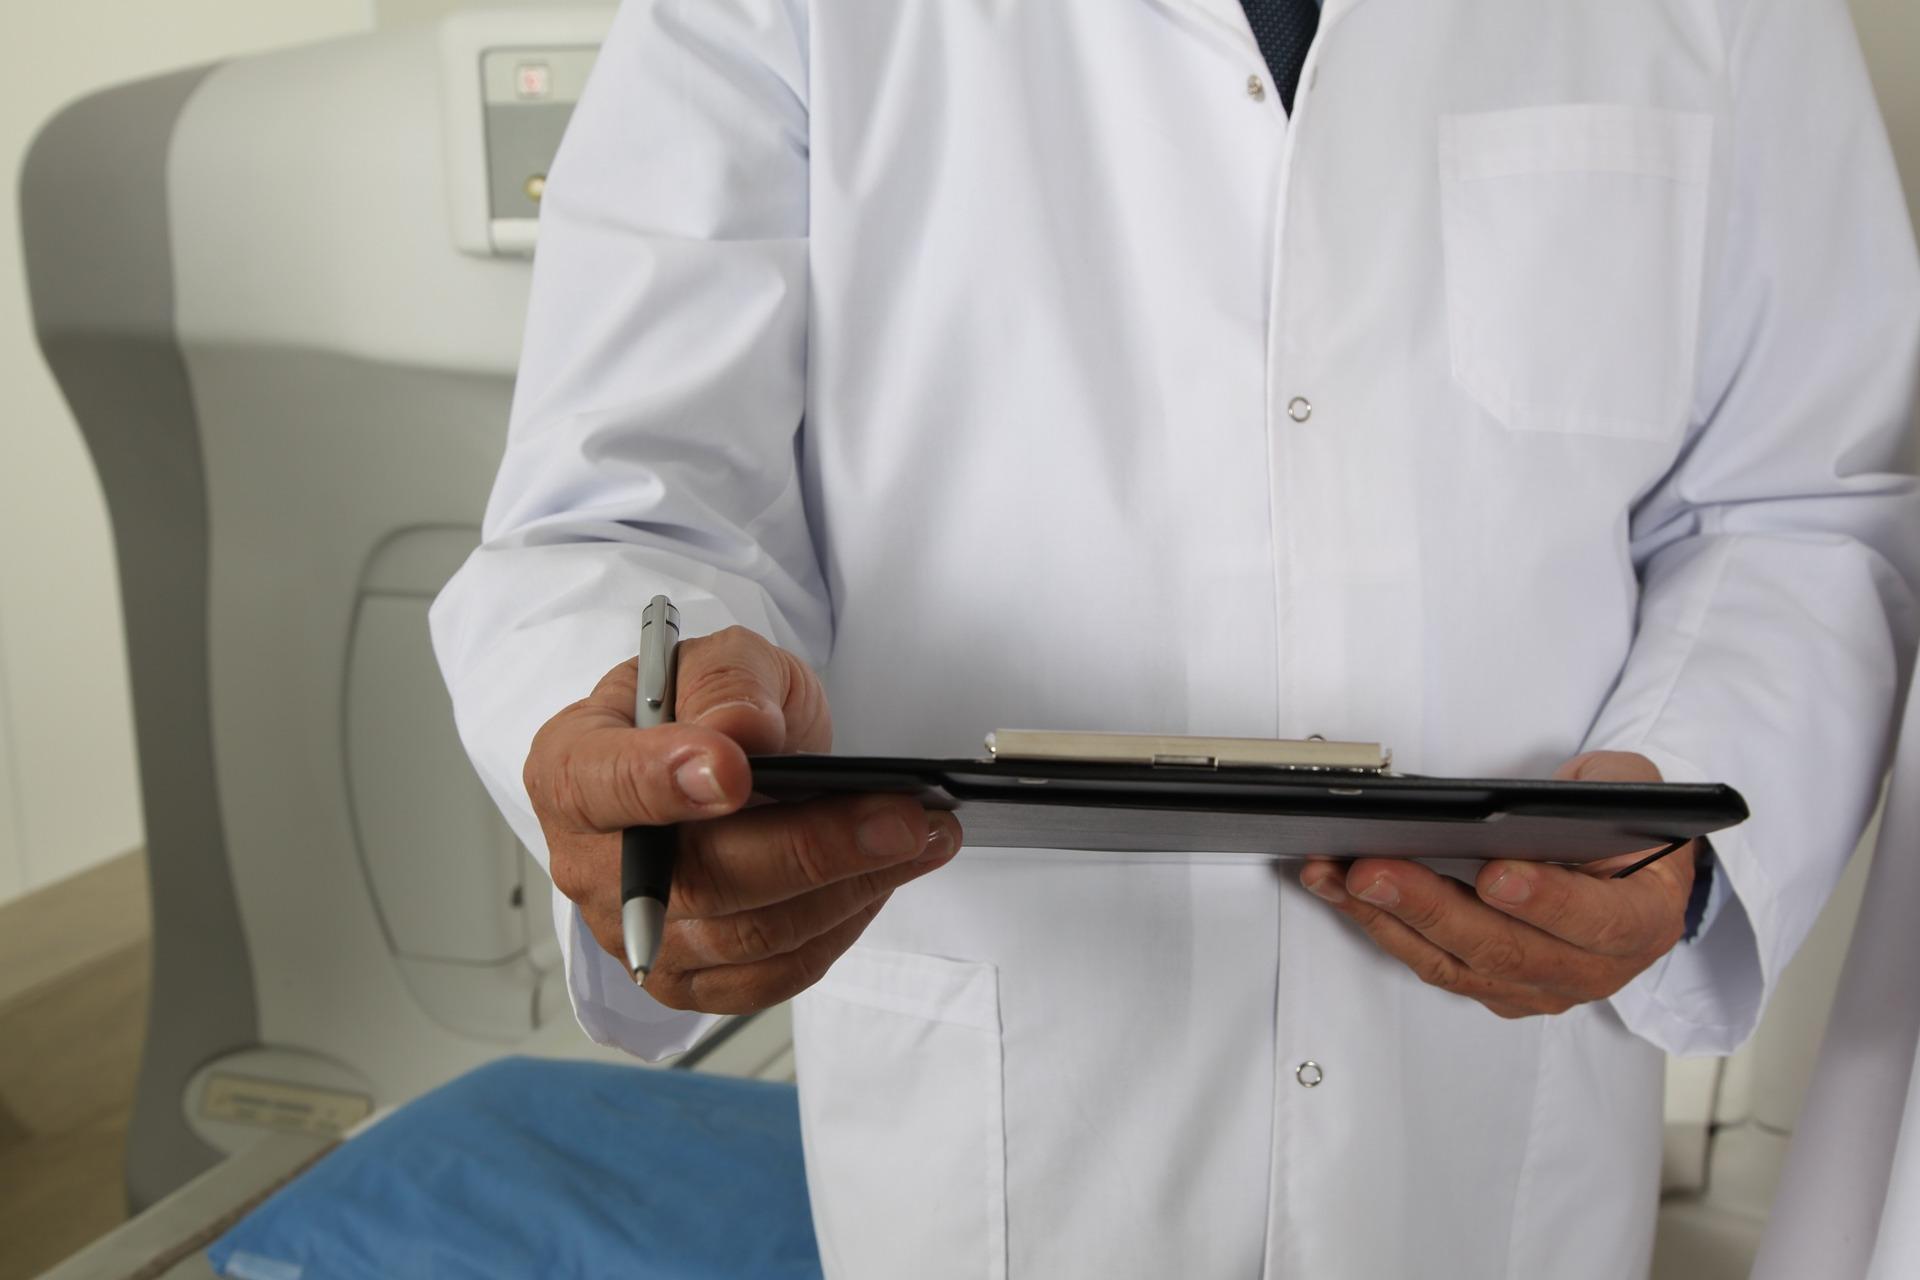 ability channel-malattia di gaucher-malattia di gaucher diagnosi strumentale-morbo di gaucher-malattie rare-malattia di gaucher sintomi